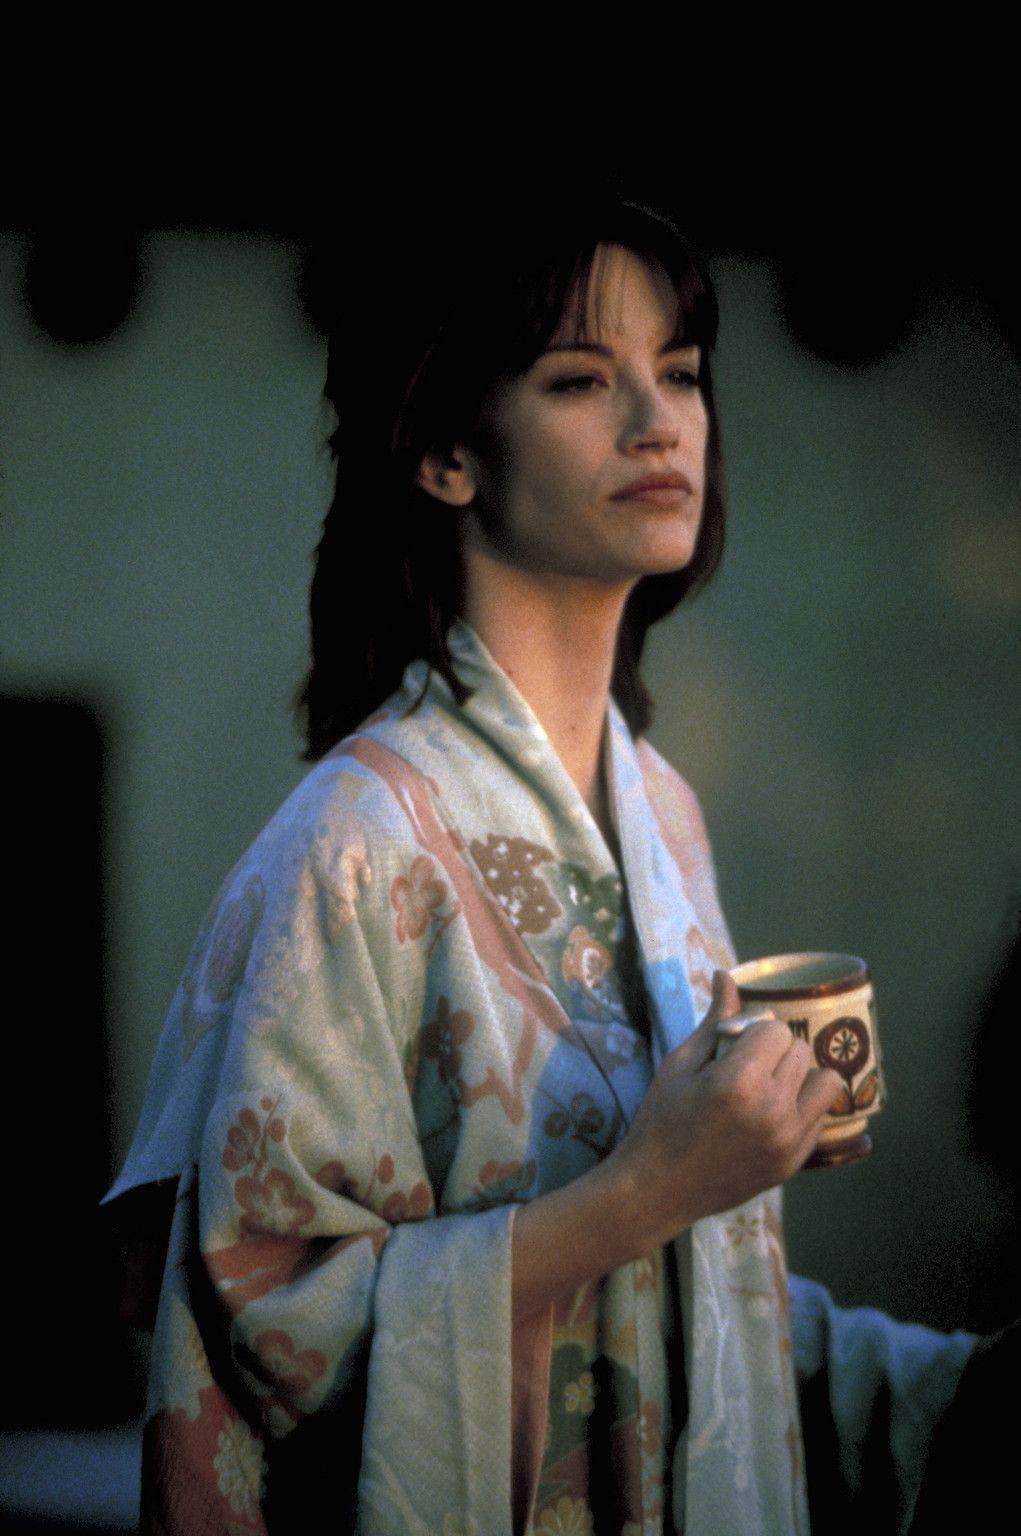 Maricar de Mesa (b. 1980),Whitney Peyton Erotic pictures Mark Critch,Hollyanne Leonard (it CAN 1 1999